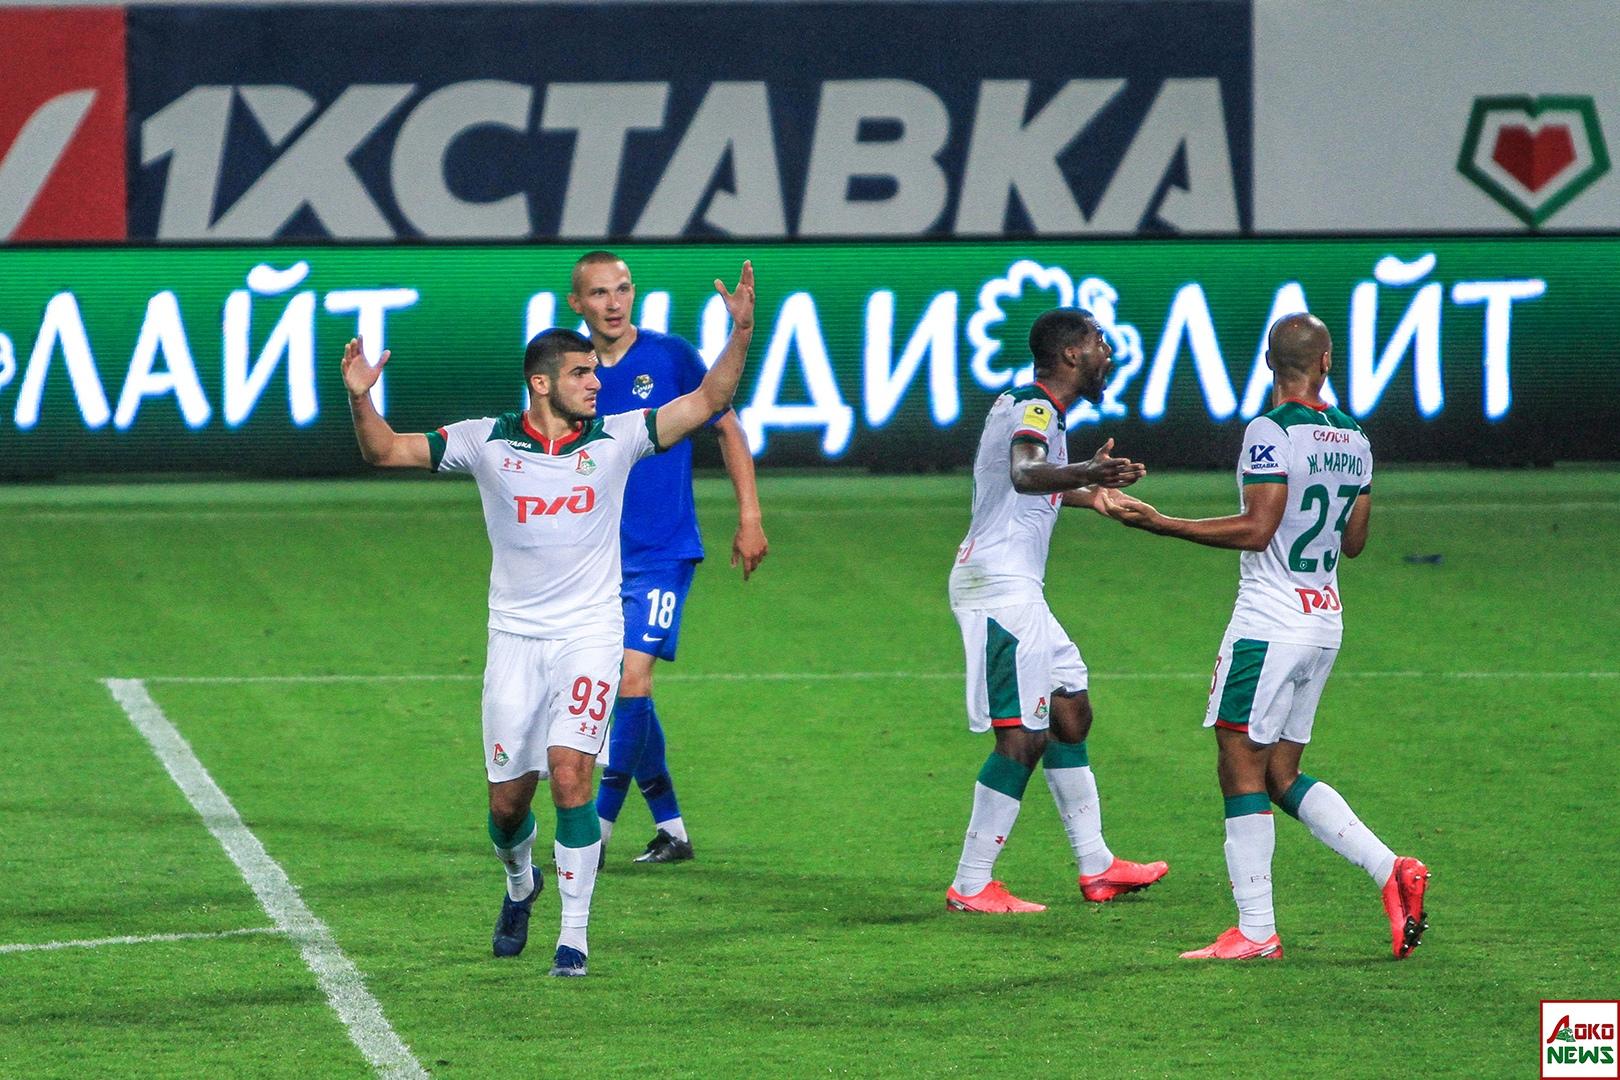 Локомотив - Сочи. Фото: Дмитрий Бурдонов / Loko.News